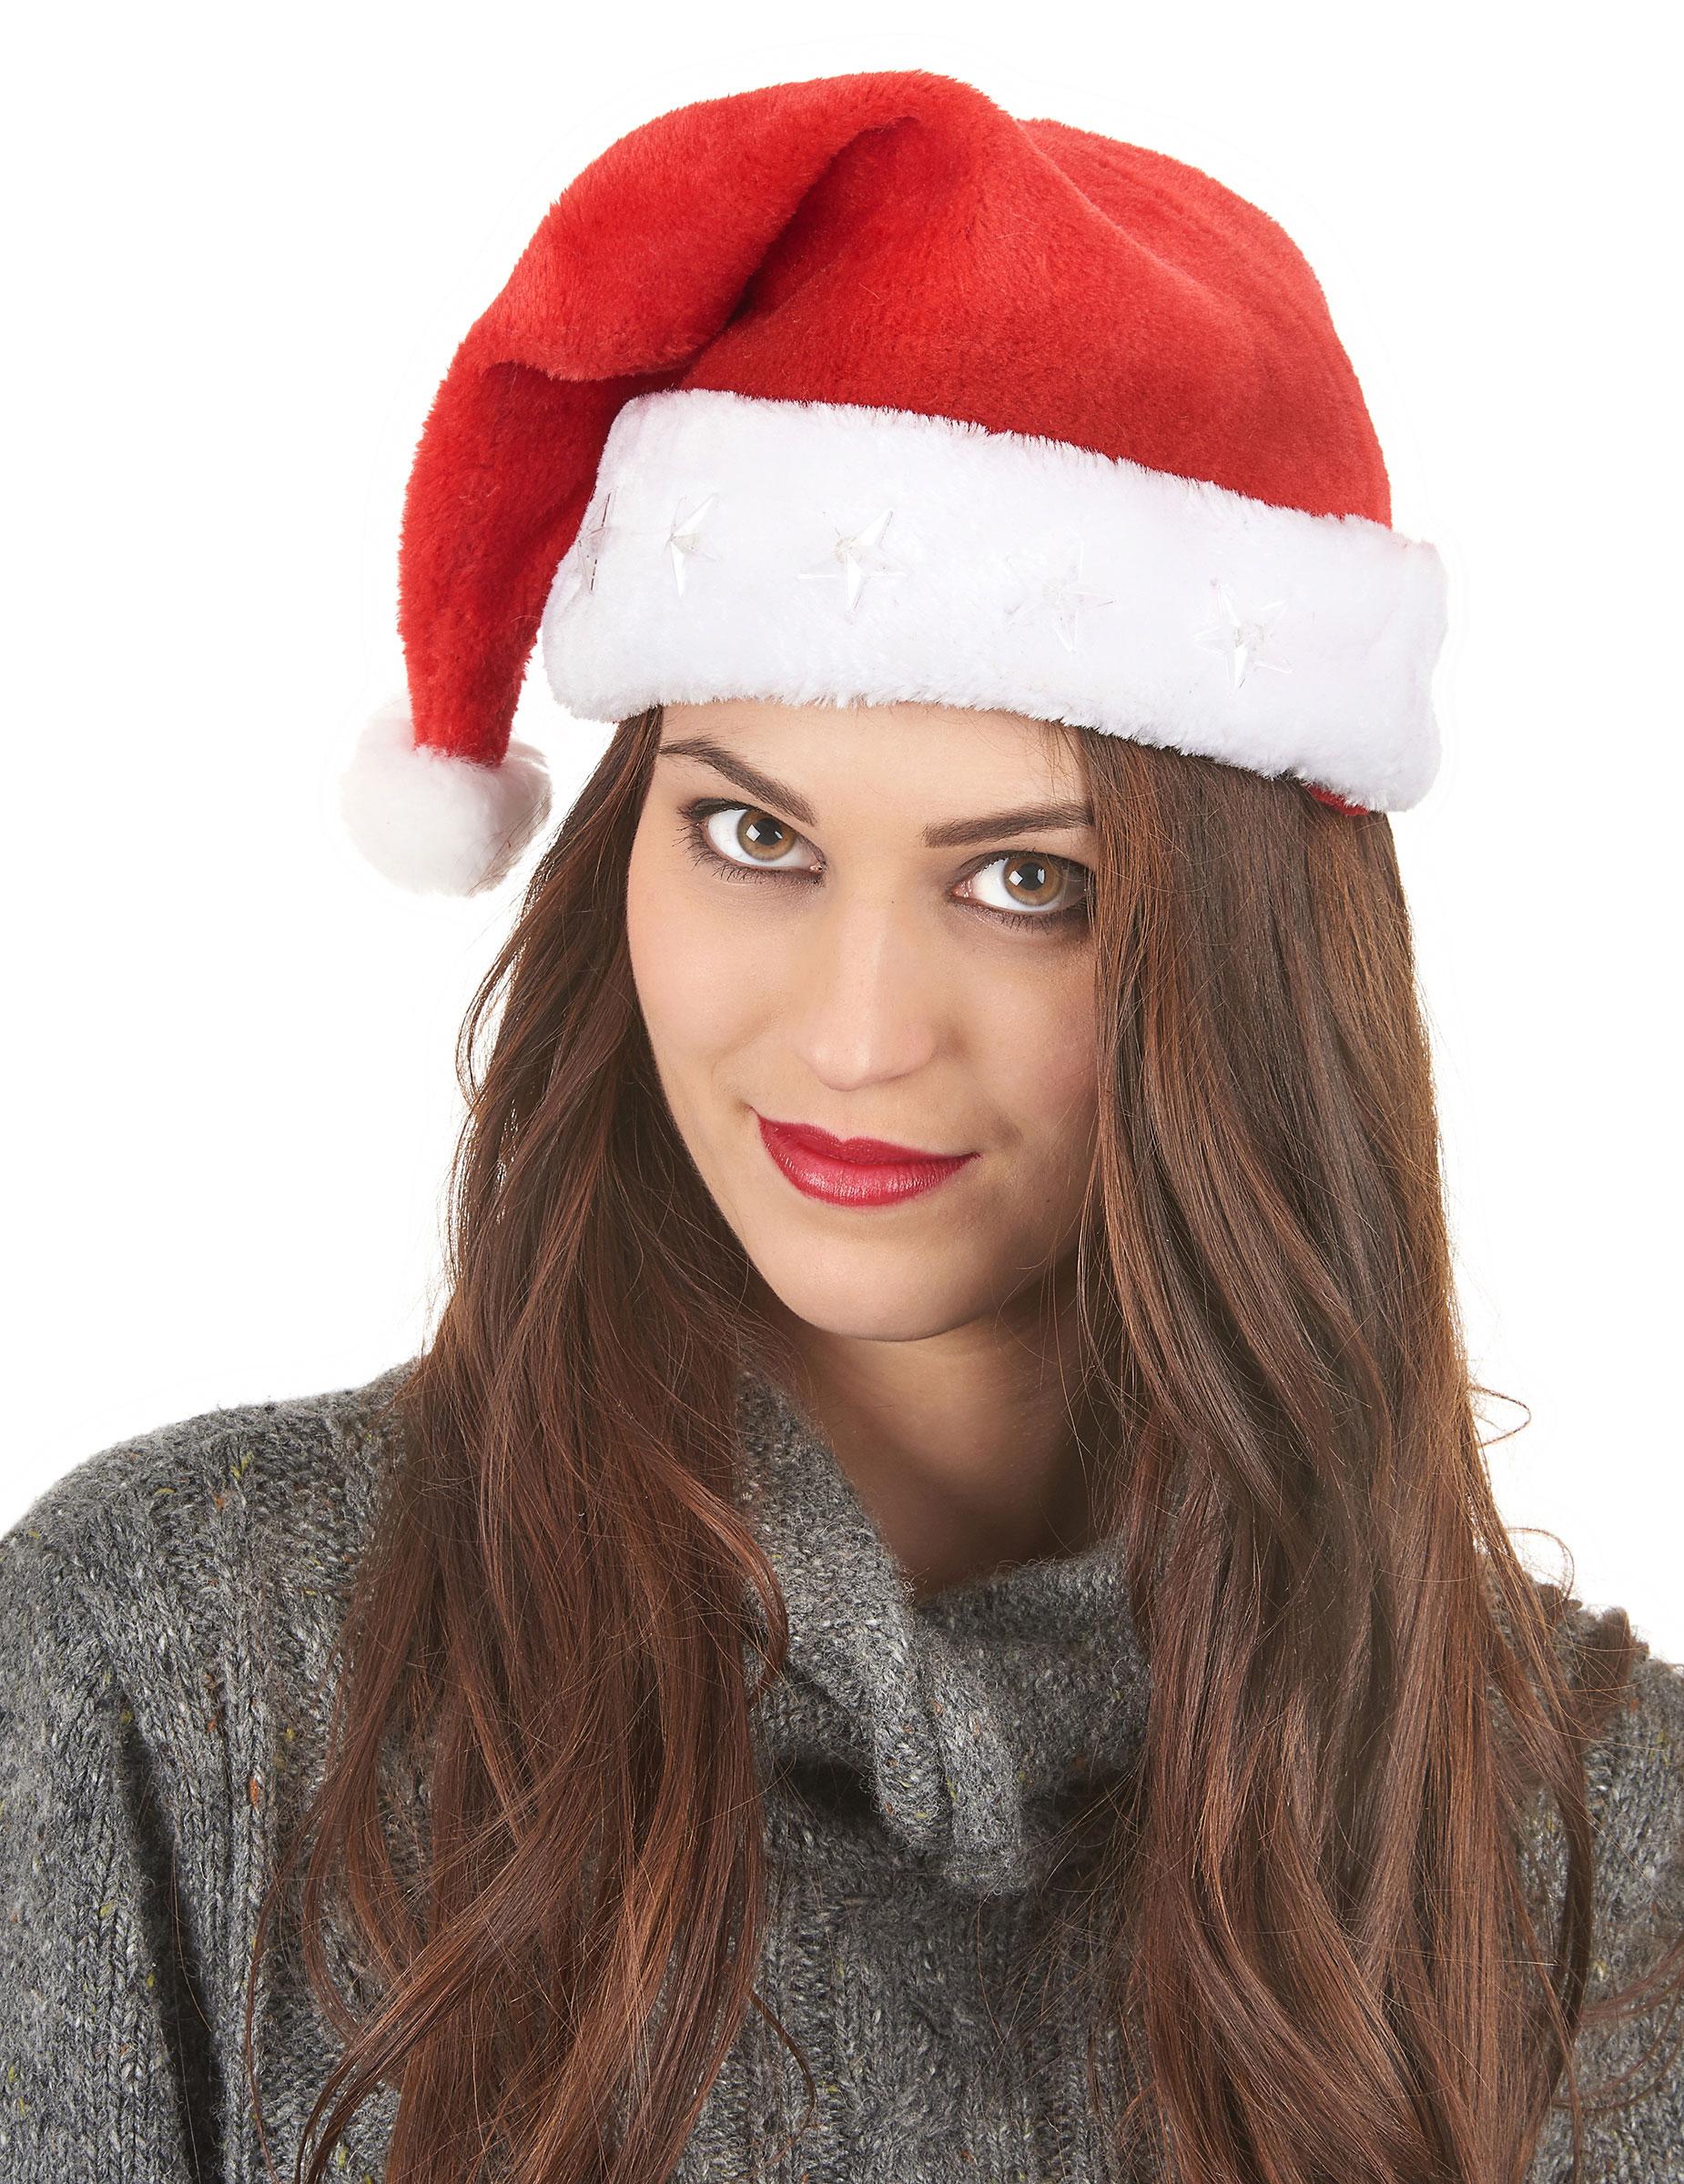 Cappello di Natale luminoso  Cappelli 38c8f7e5b0d4